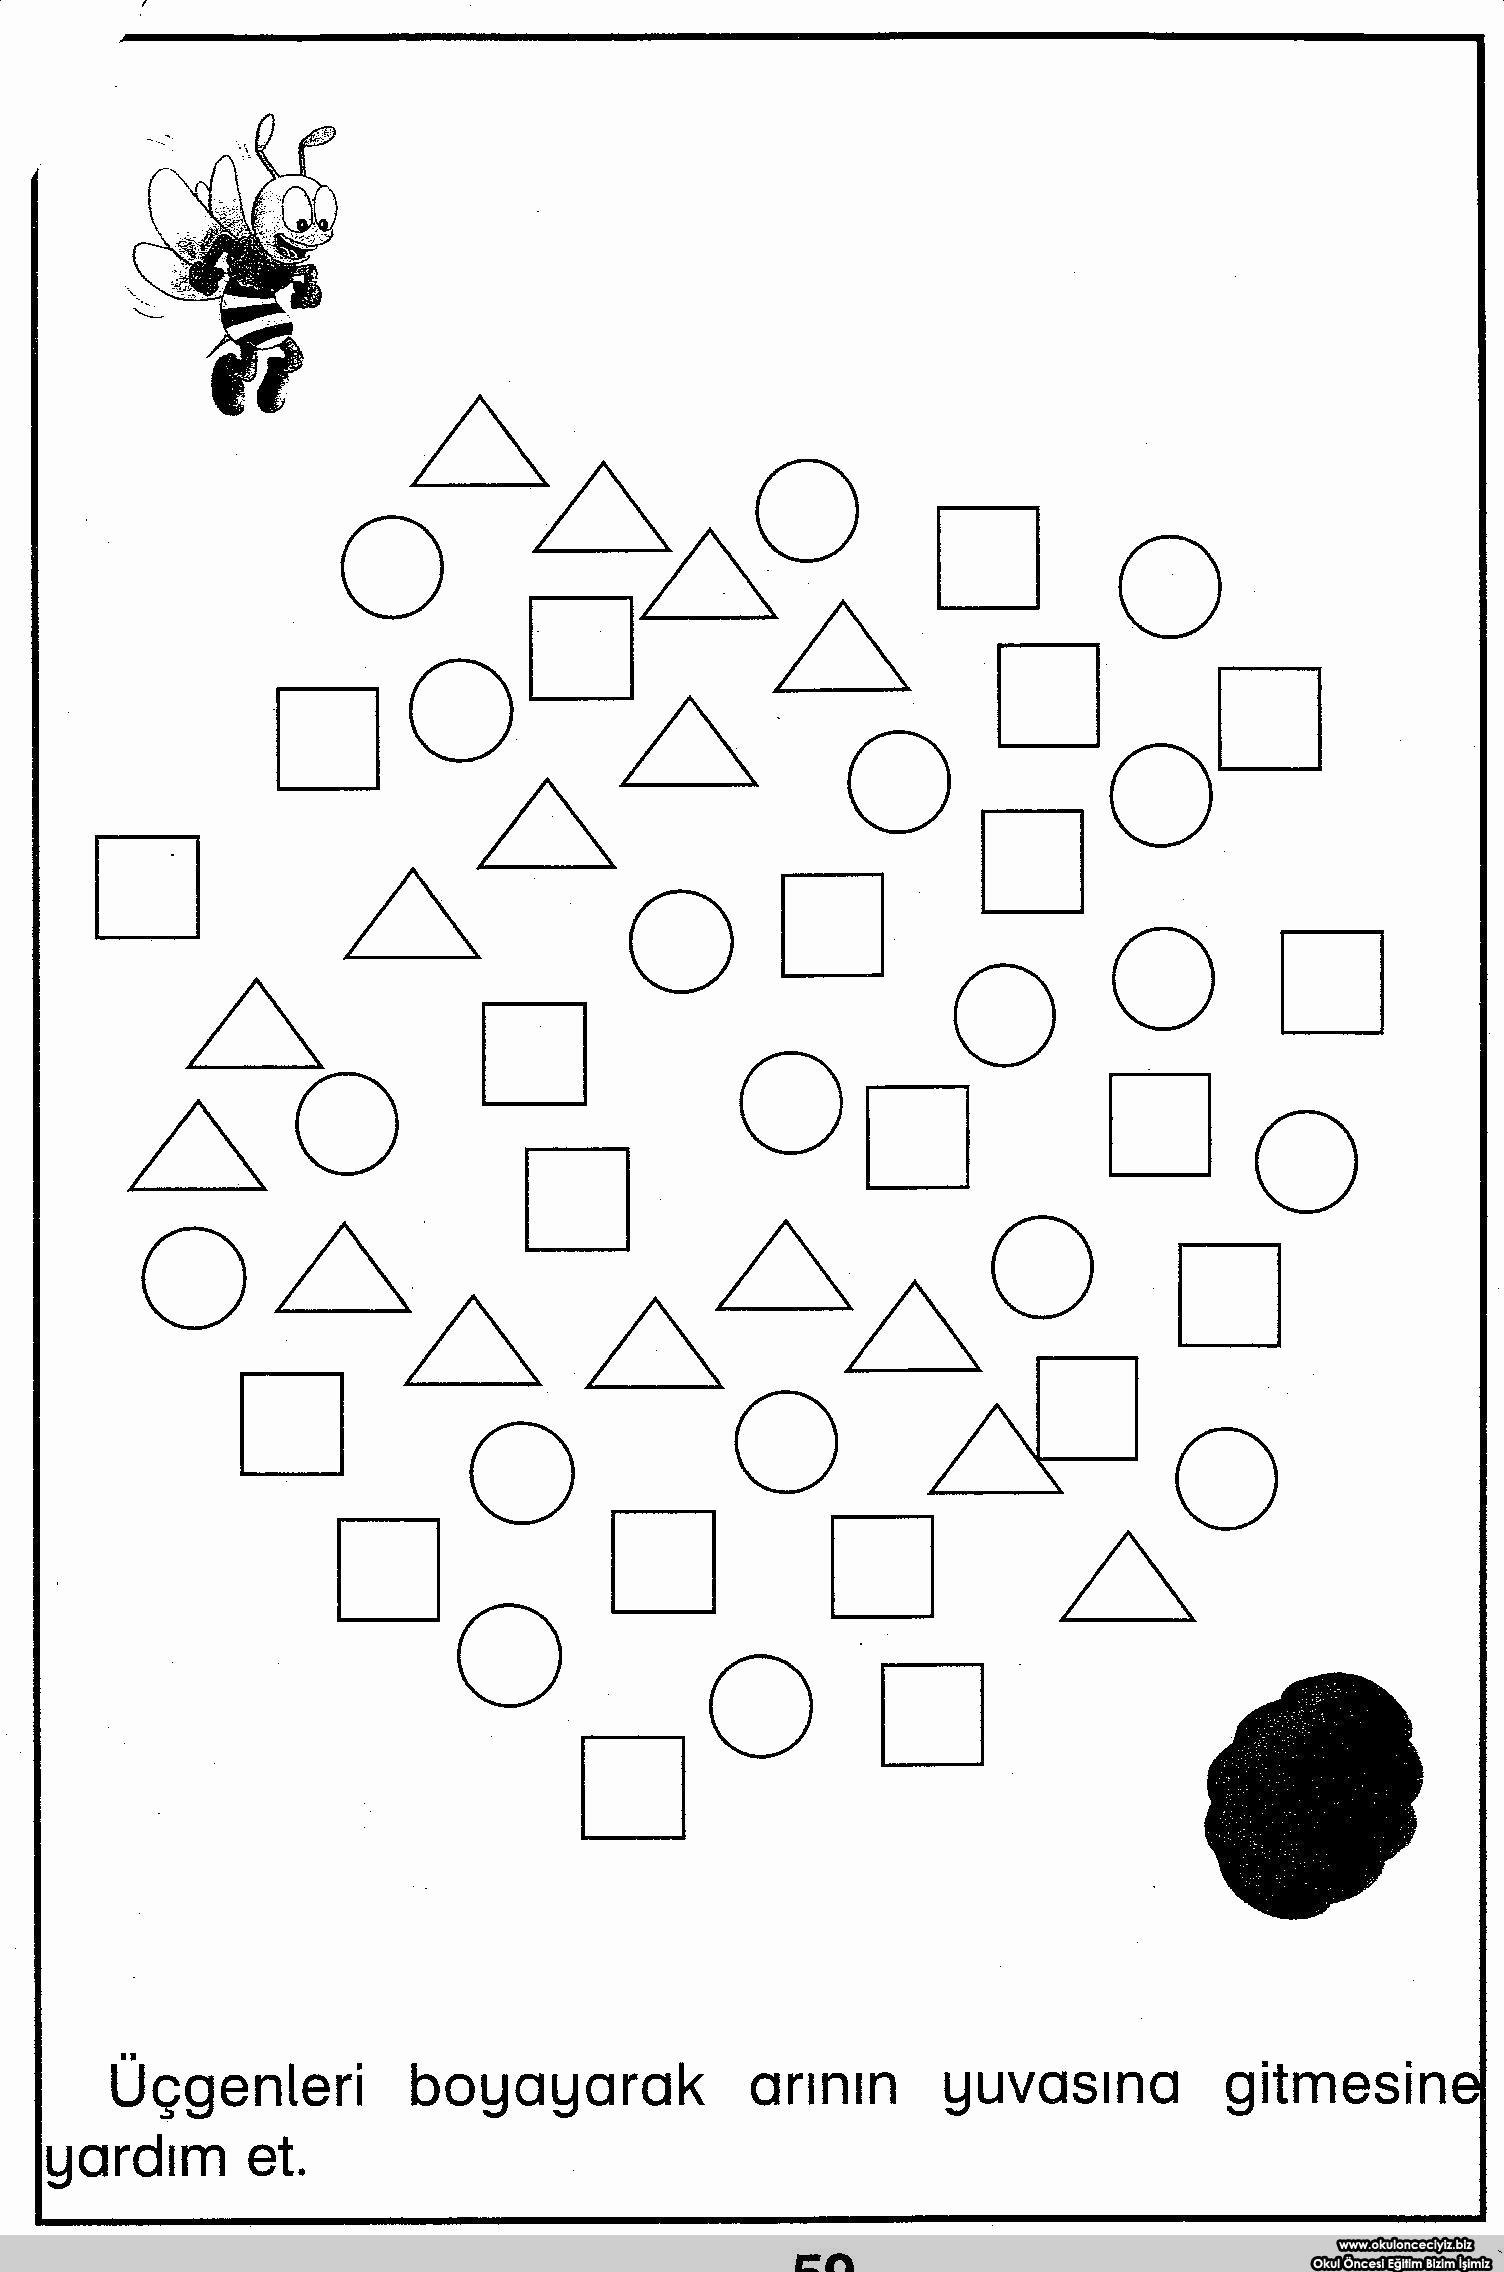 Triangle Printable Worksheets for Preschoolers Awesome Triangle Tracing Worksheet for toddlers Printable Worksheets